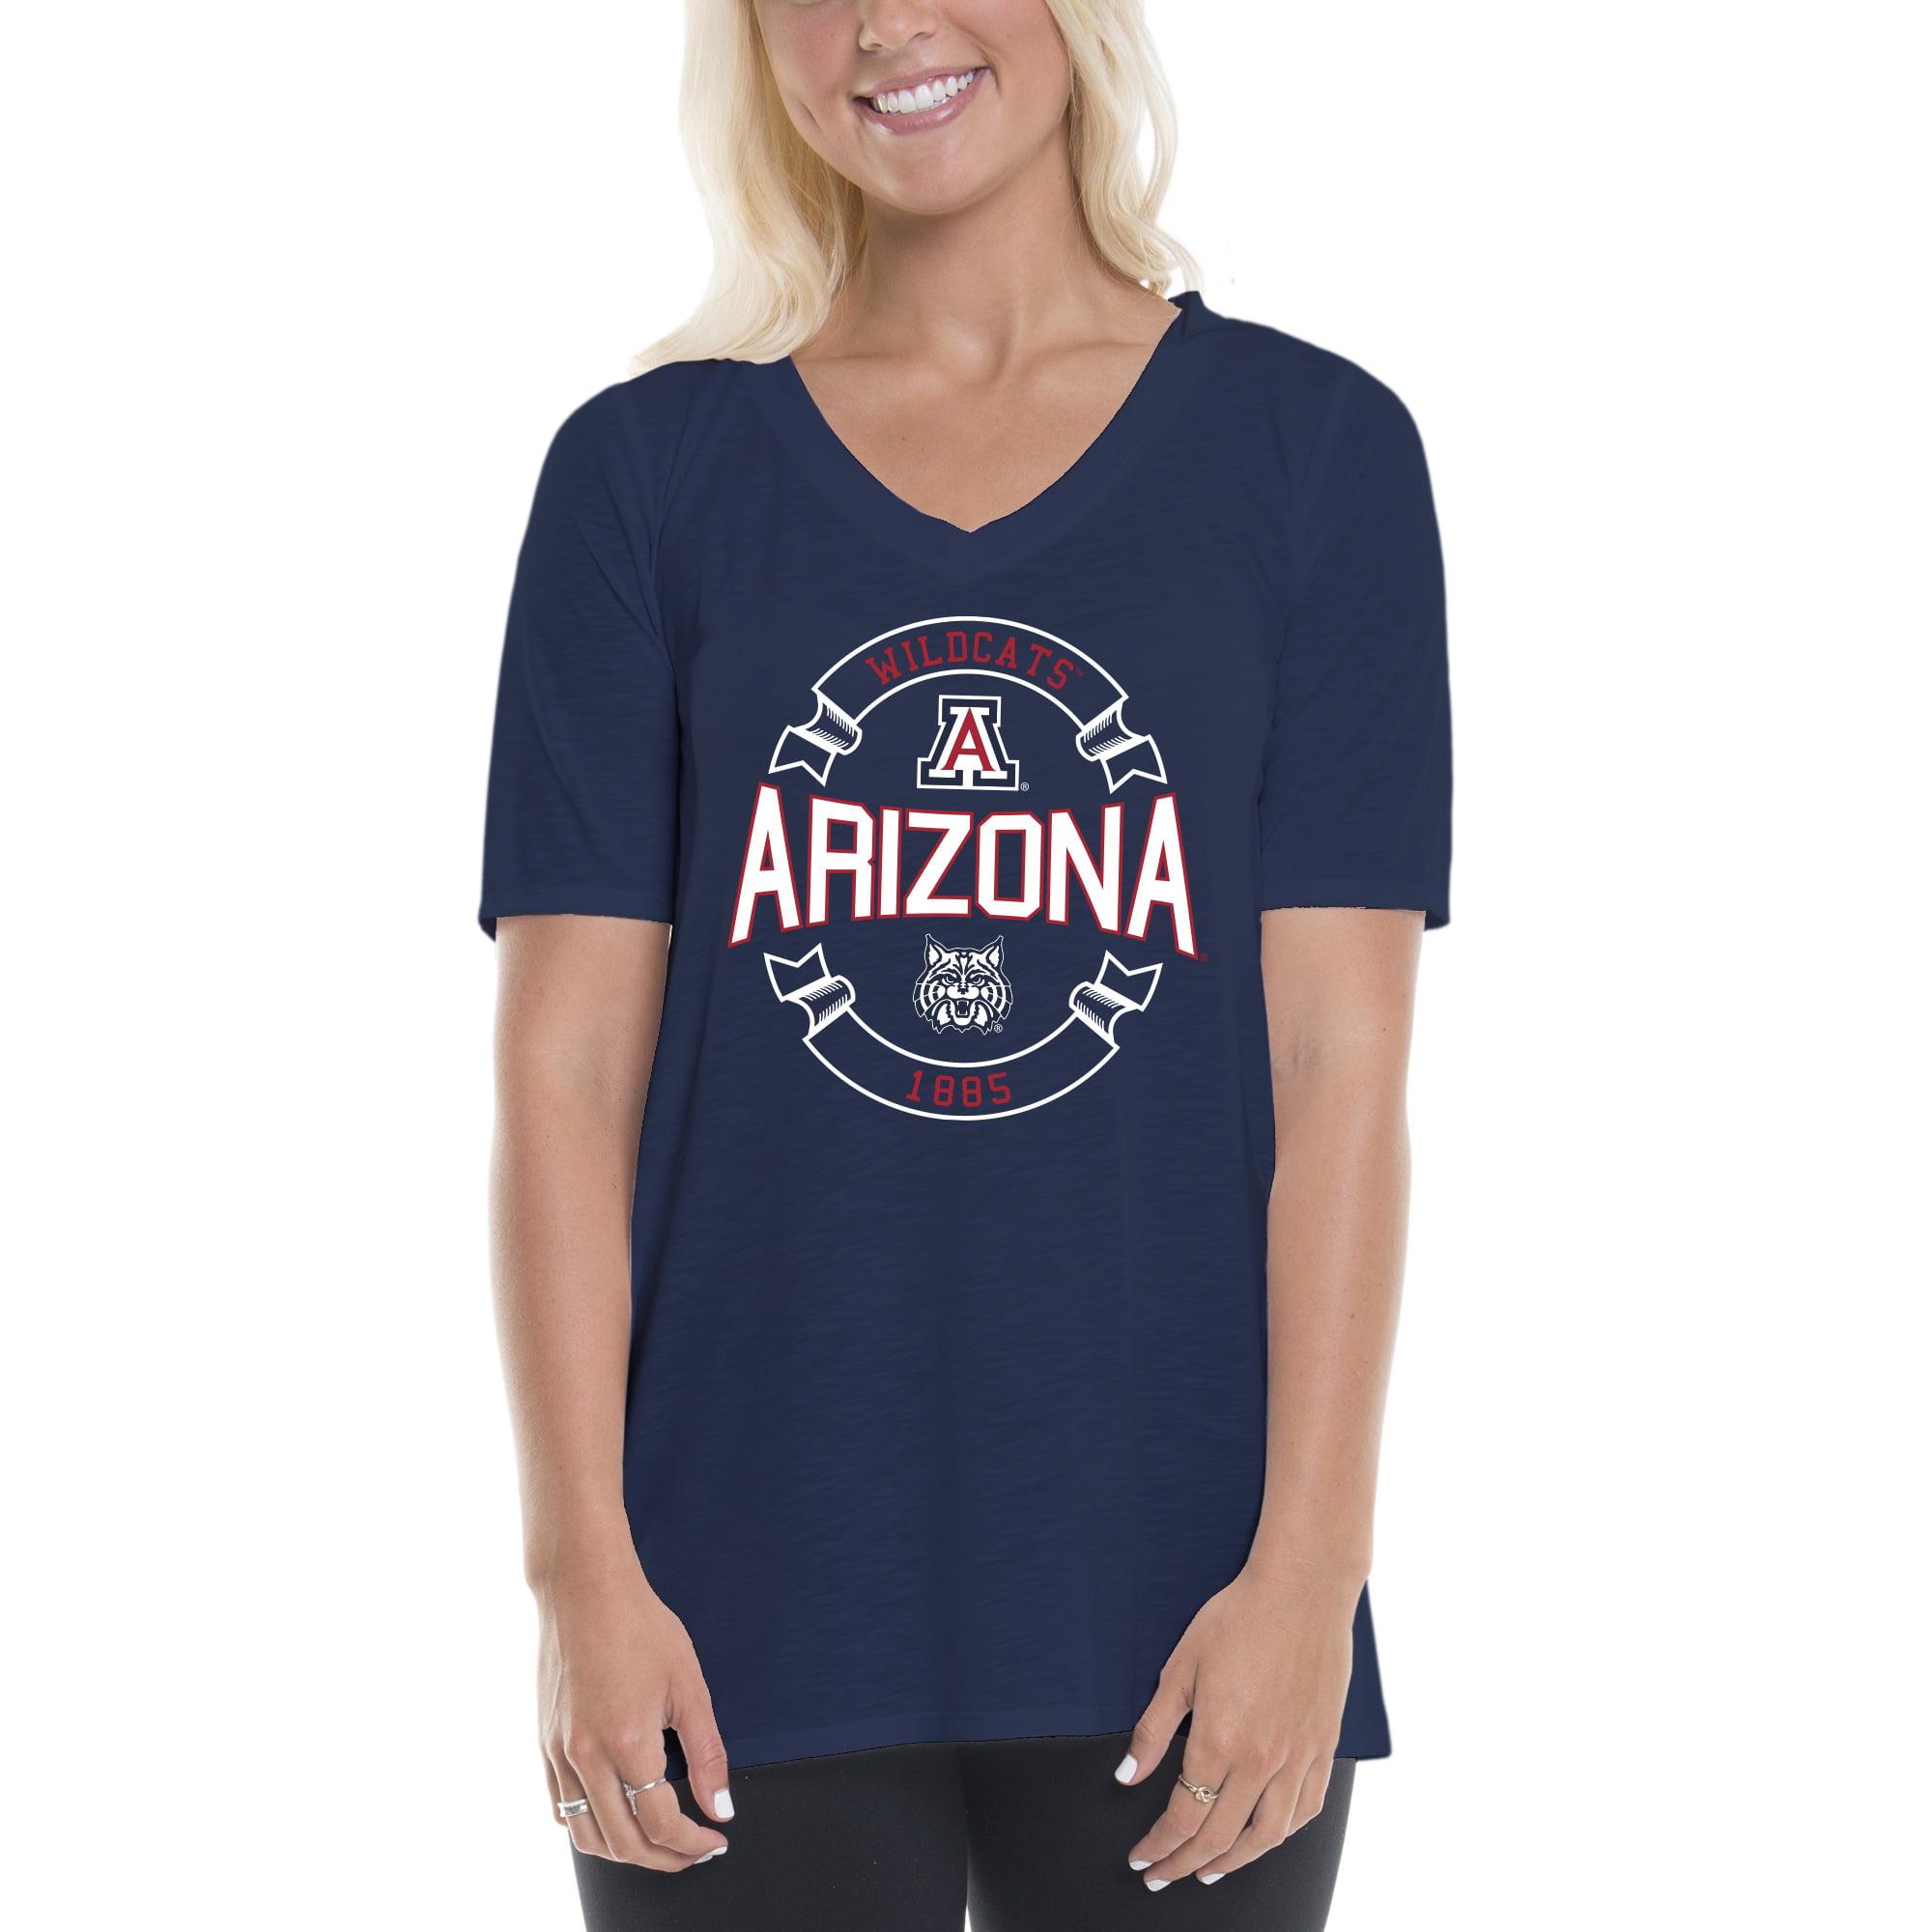 Women's Navy/Red Arizona Wildcats Double Ribbon Arch V-Neck T-Shirt